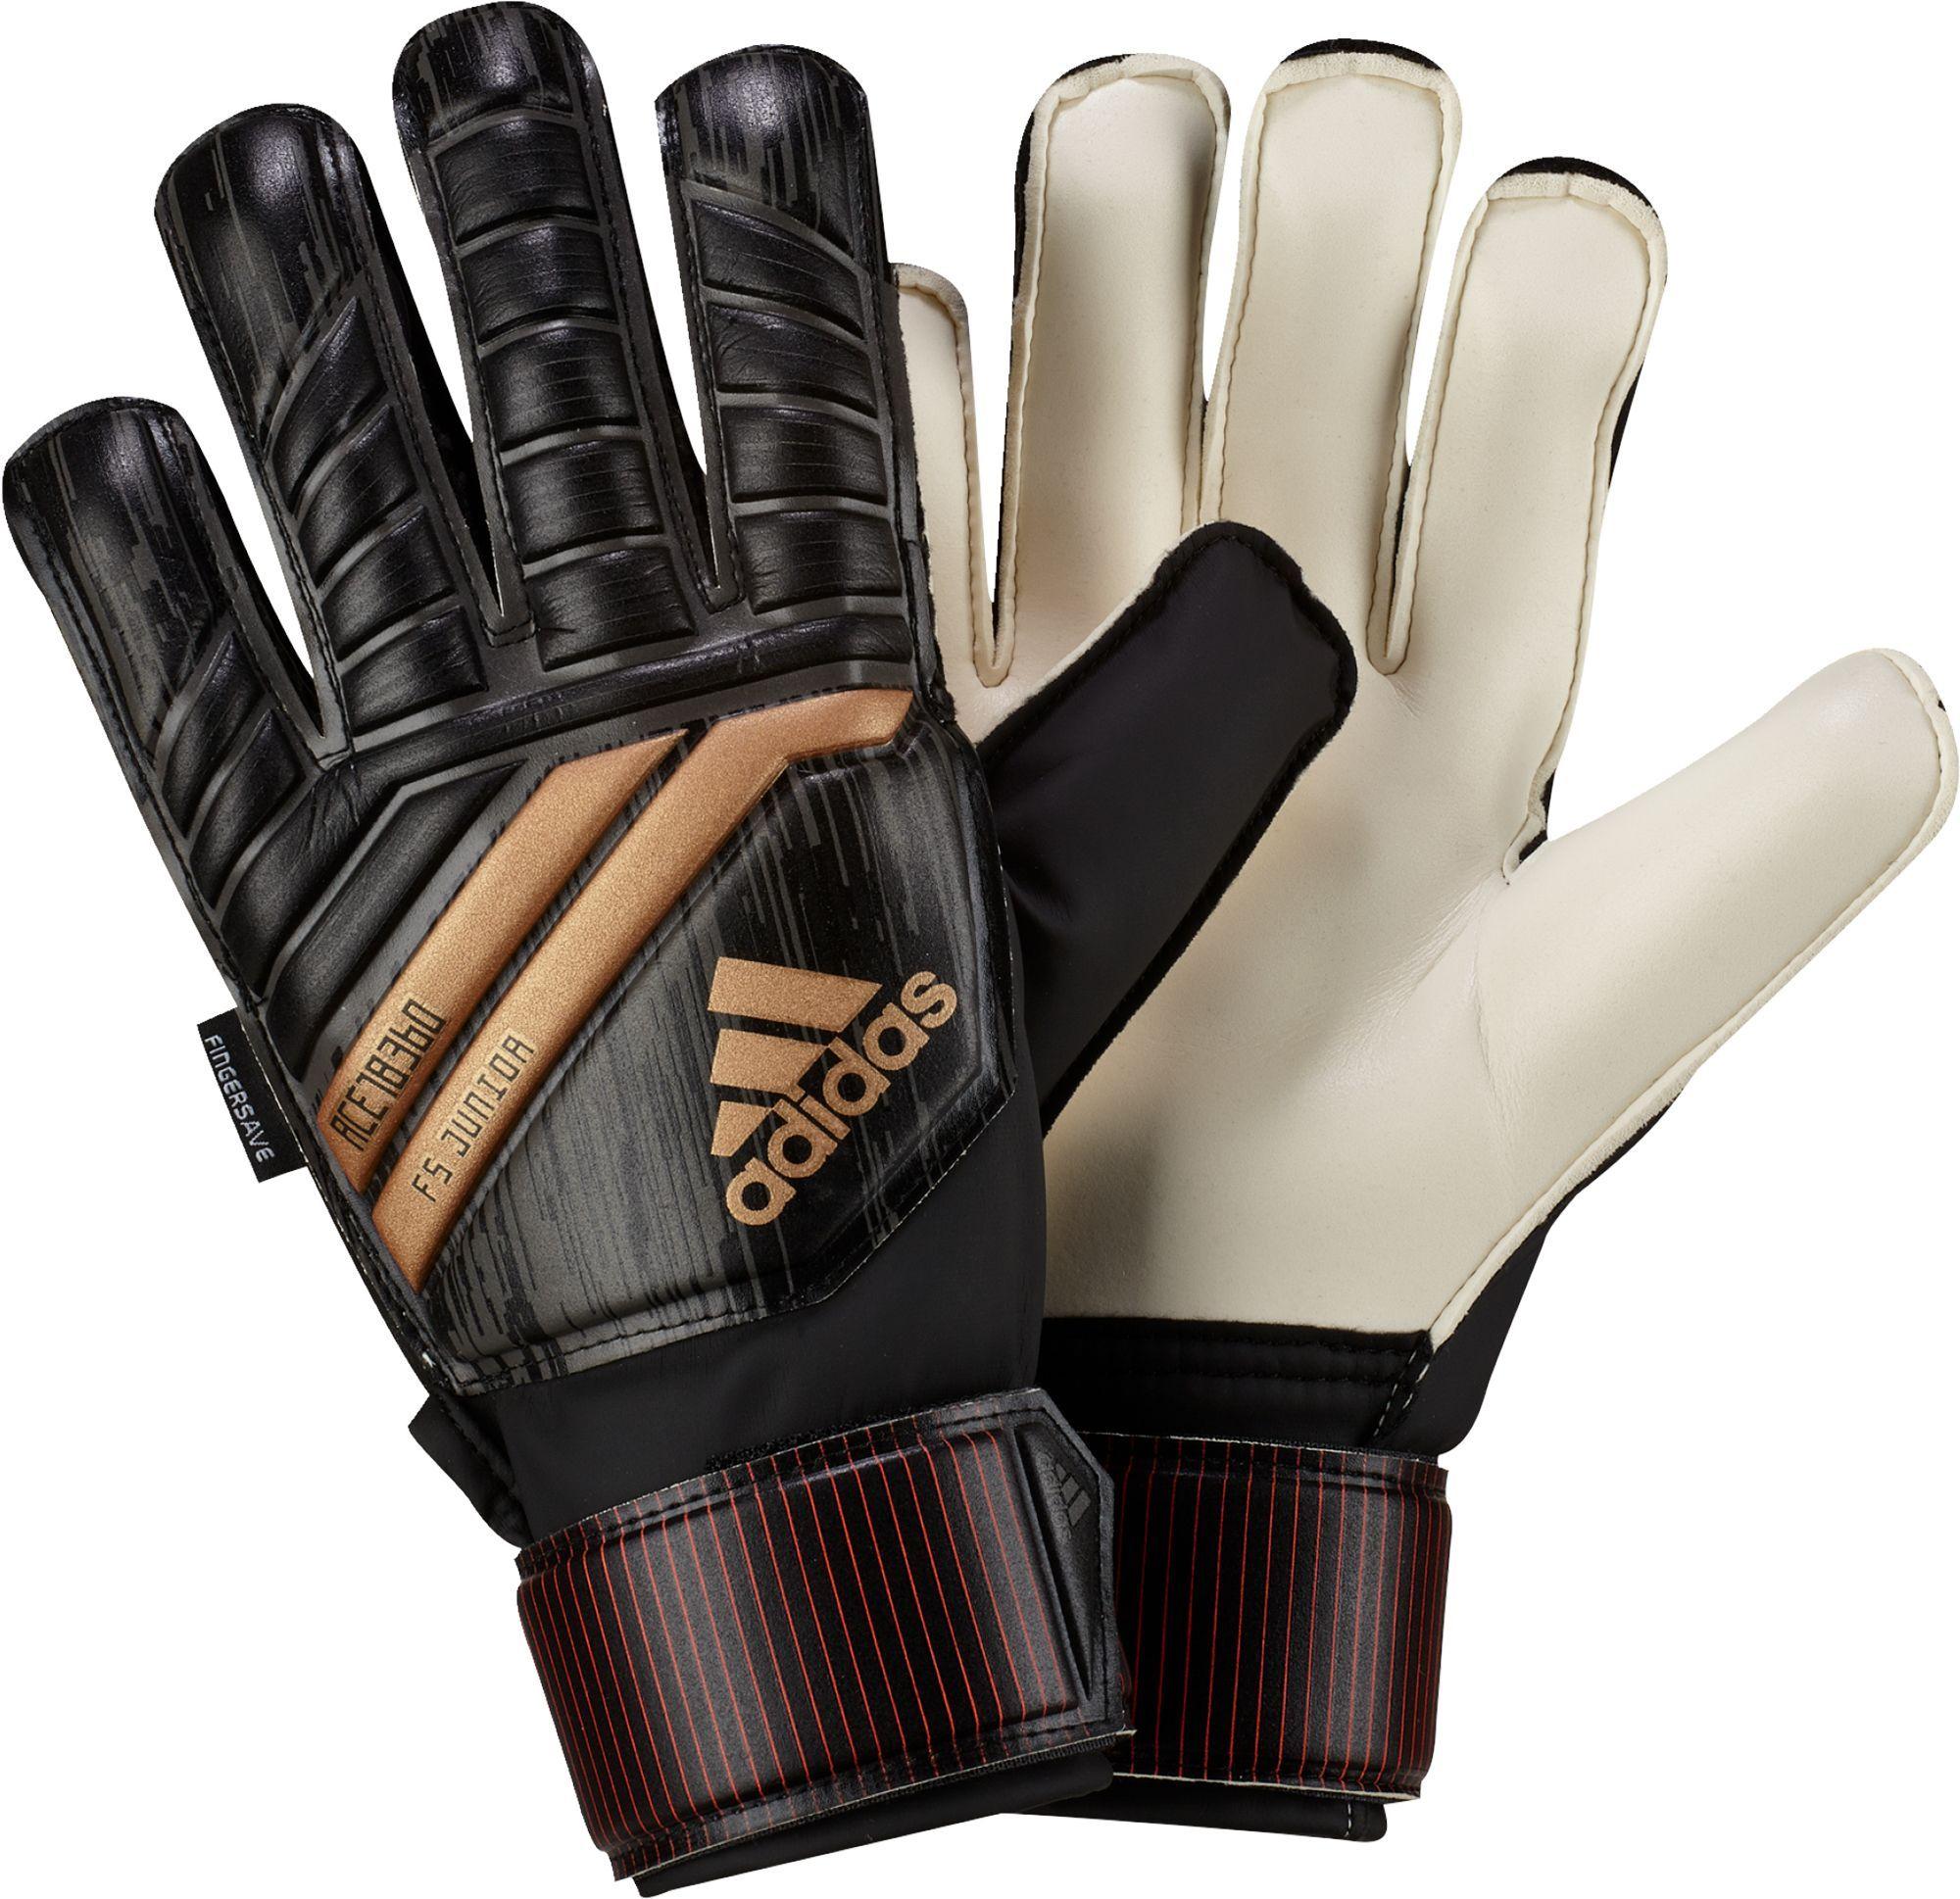 e202c3c052a6 adidas Predator Fingersave Junior Soccer Goalkeeper Gloves